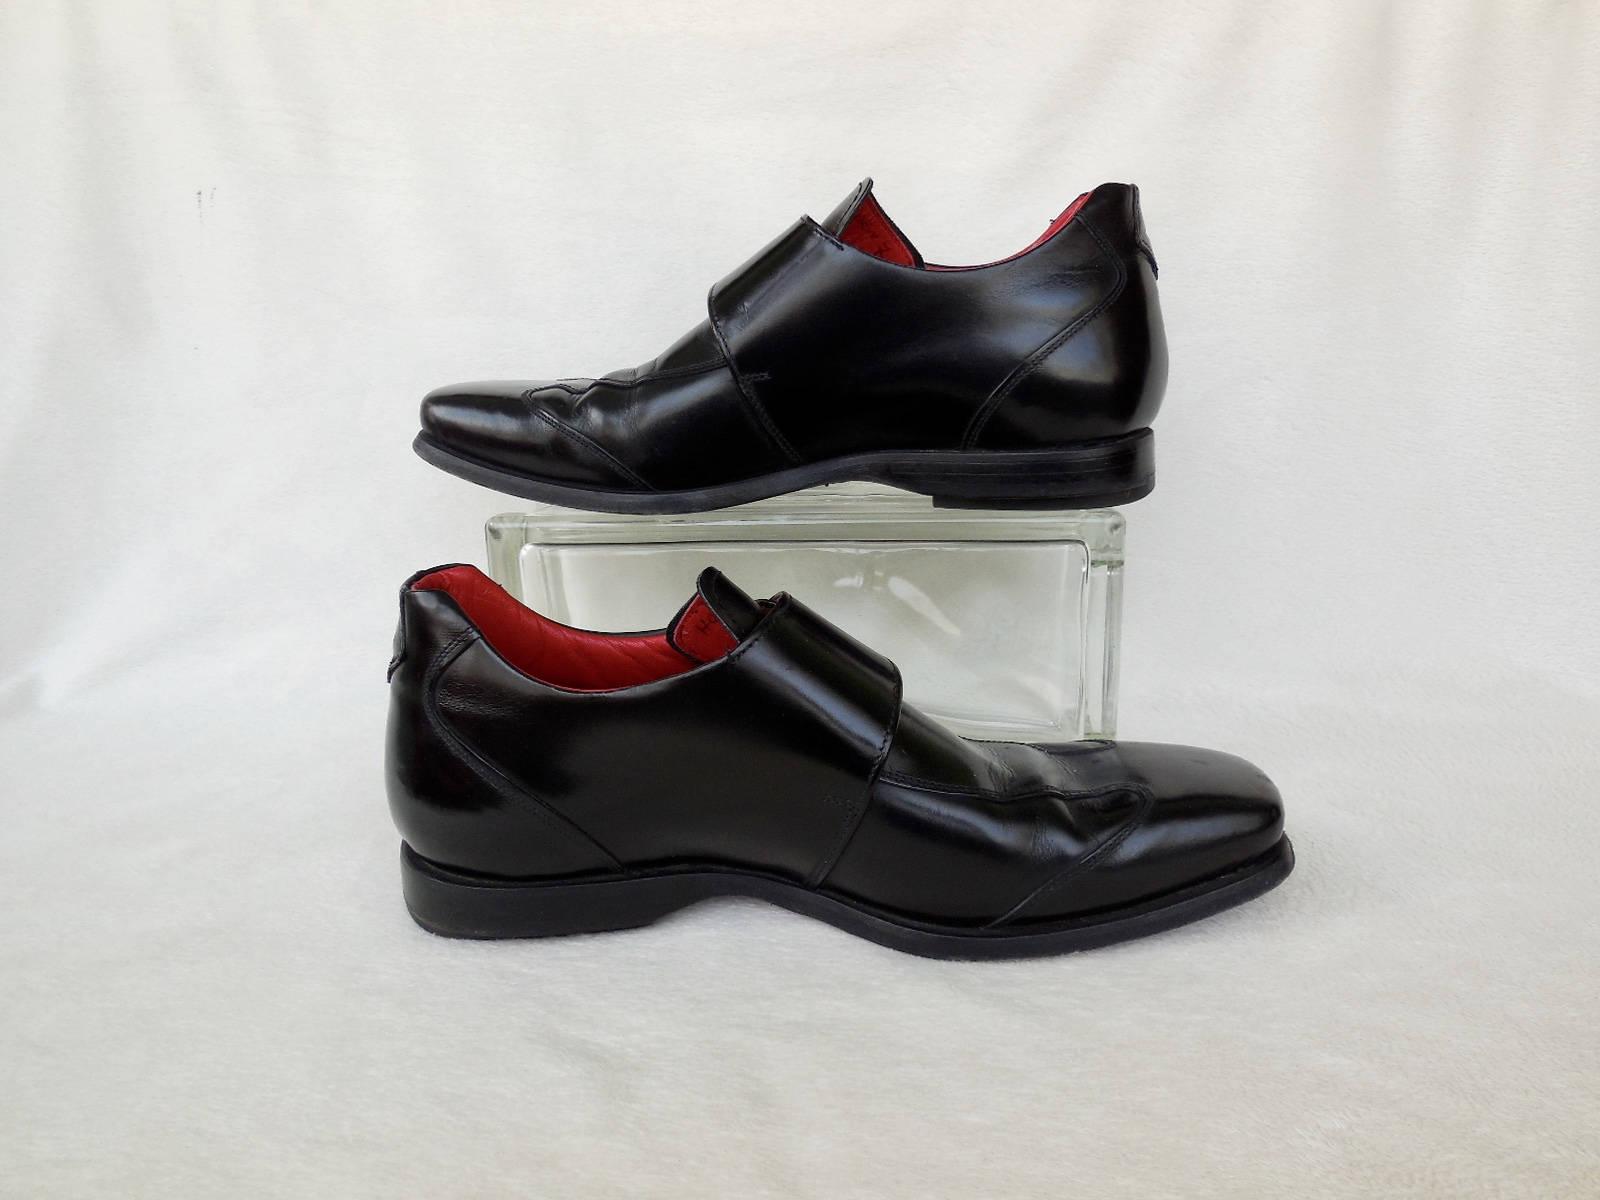 MOD Beatnik Shoes/JEFFREY WEST/Monk Shoes/Rockabilly/Punk Strap/Mens Dress Shoes/Preppy Dress Shoes/Rockabilly/Punk WEST/Monk Rocker/Mister Lucky/Mens Size 8/Made N Italy a91779